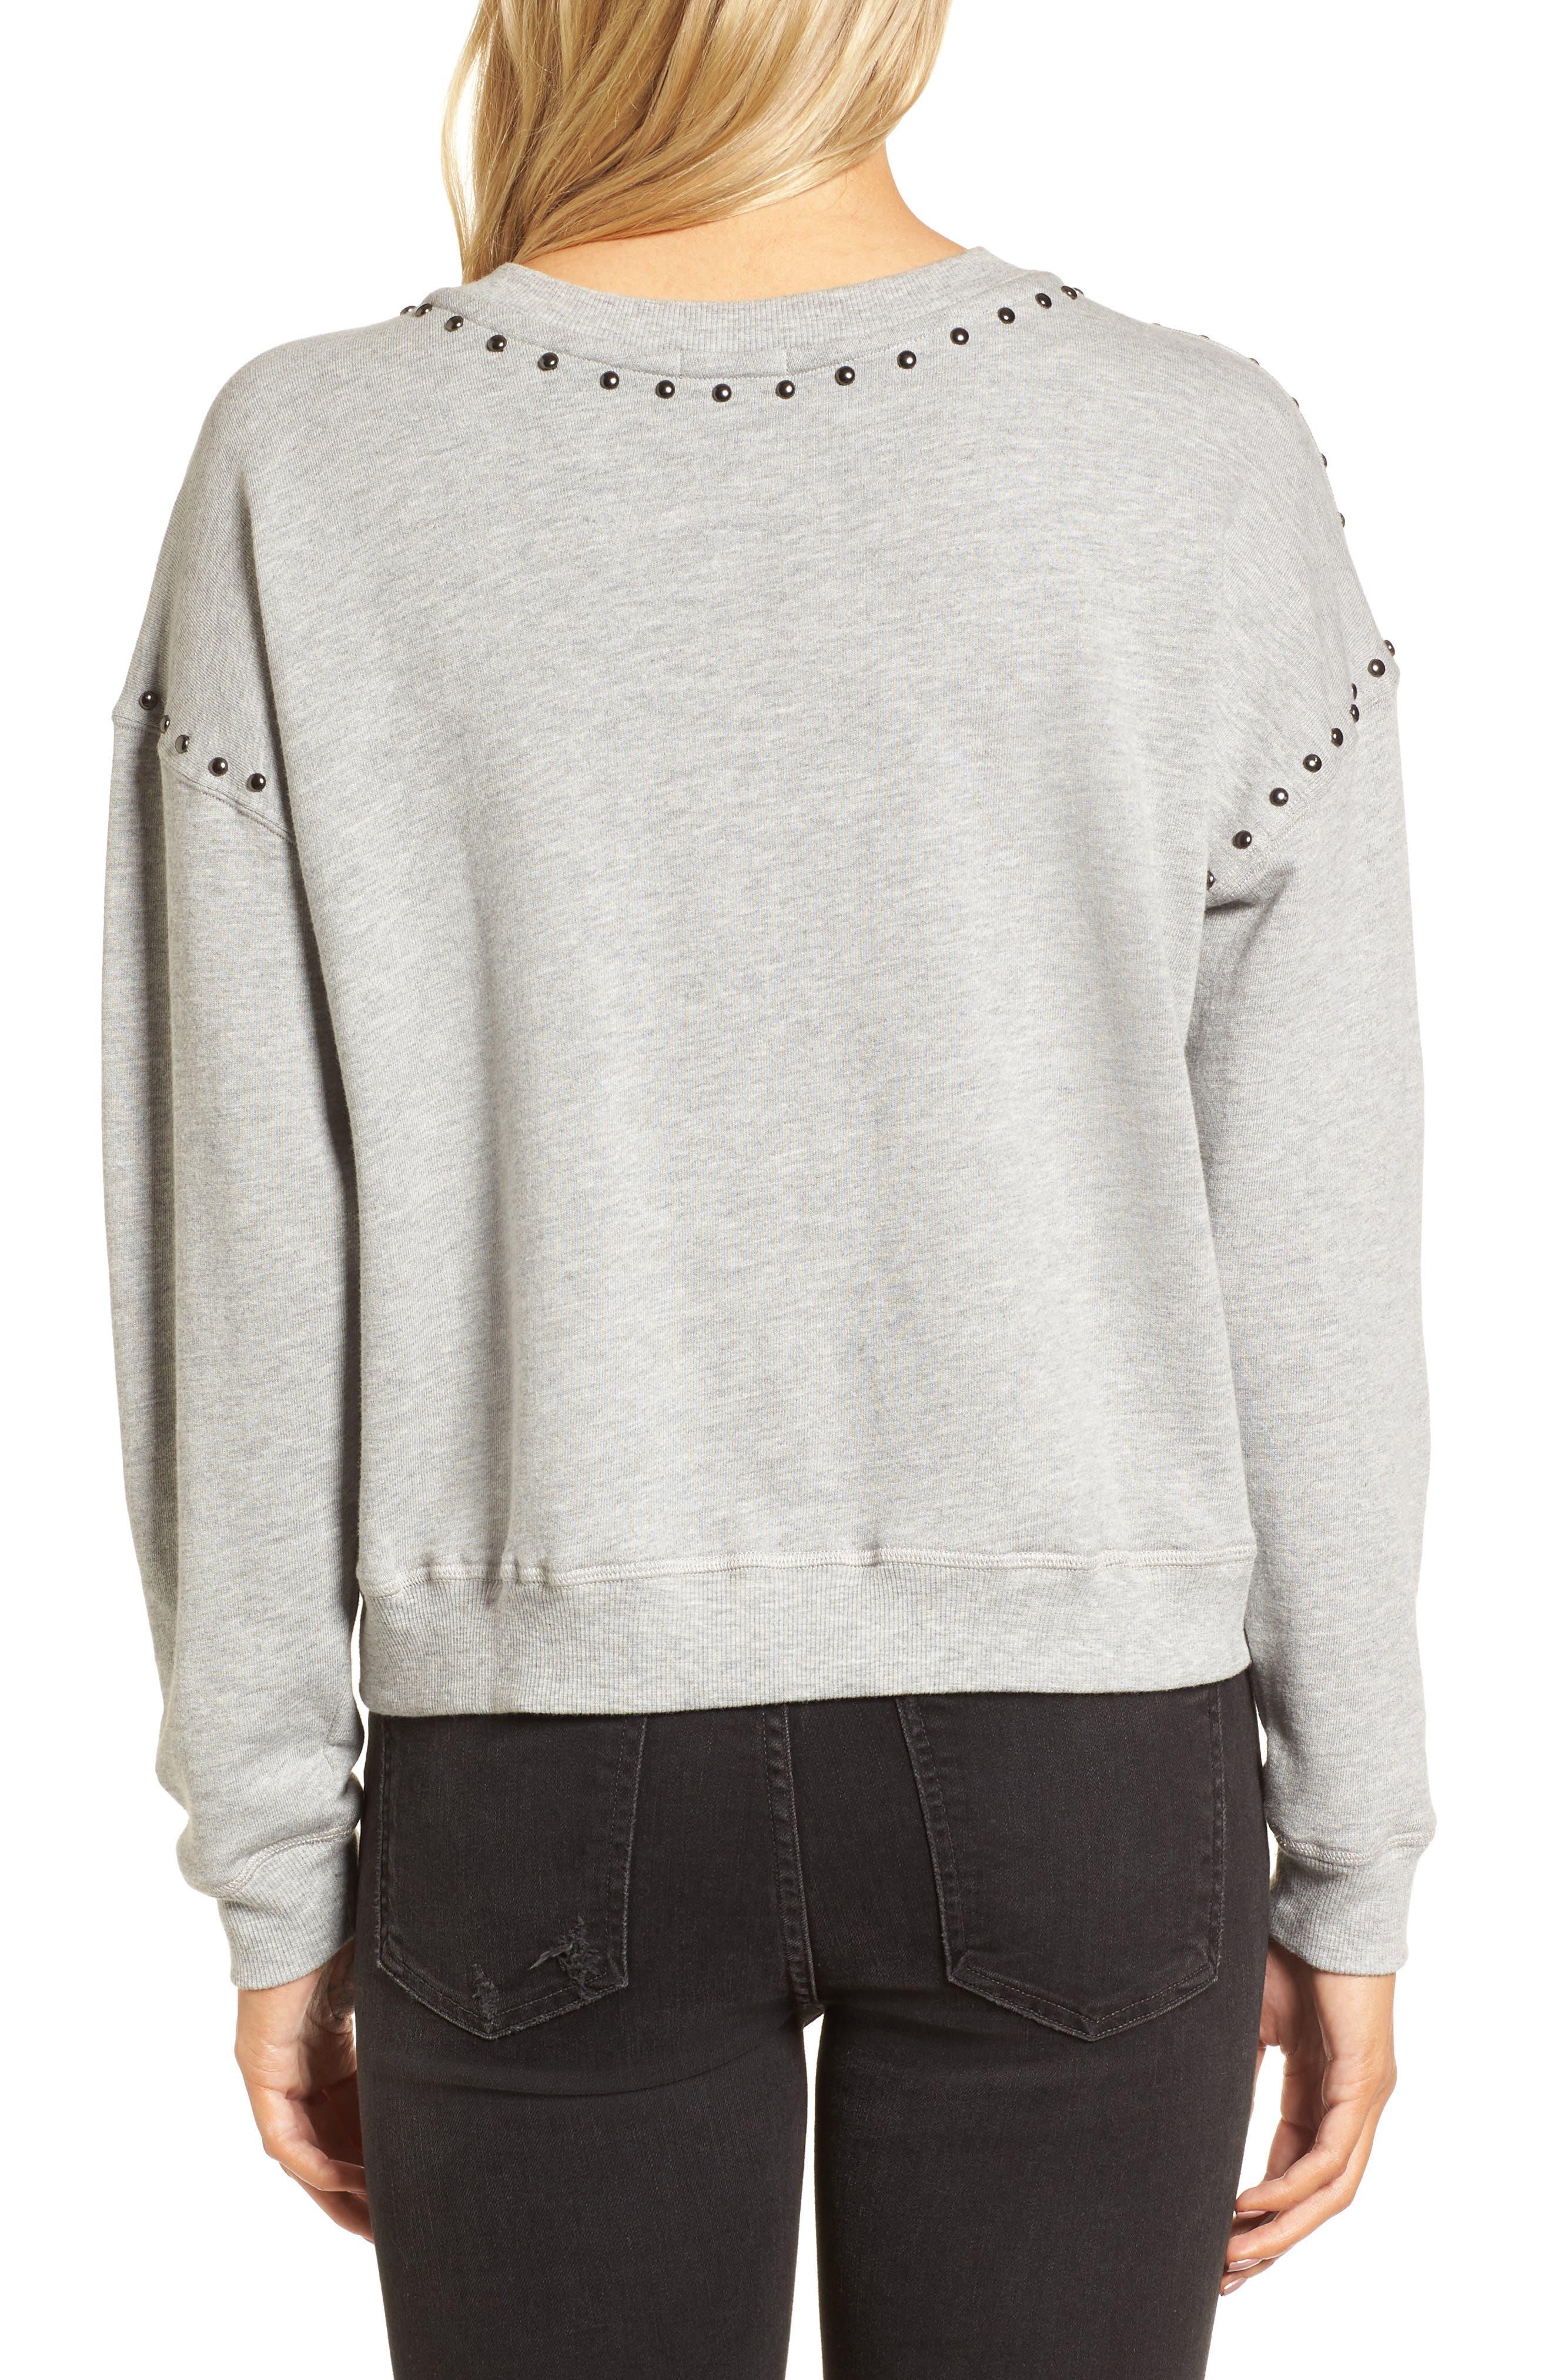 Wilson Studded Sweatshirt,                             Alternate thumbnail 2, color,                             Heather Grey